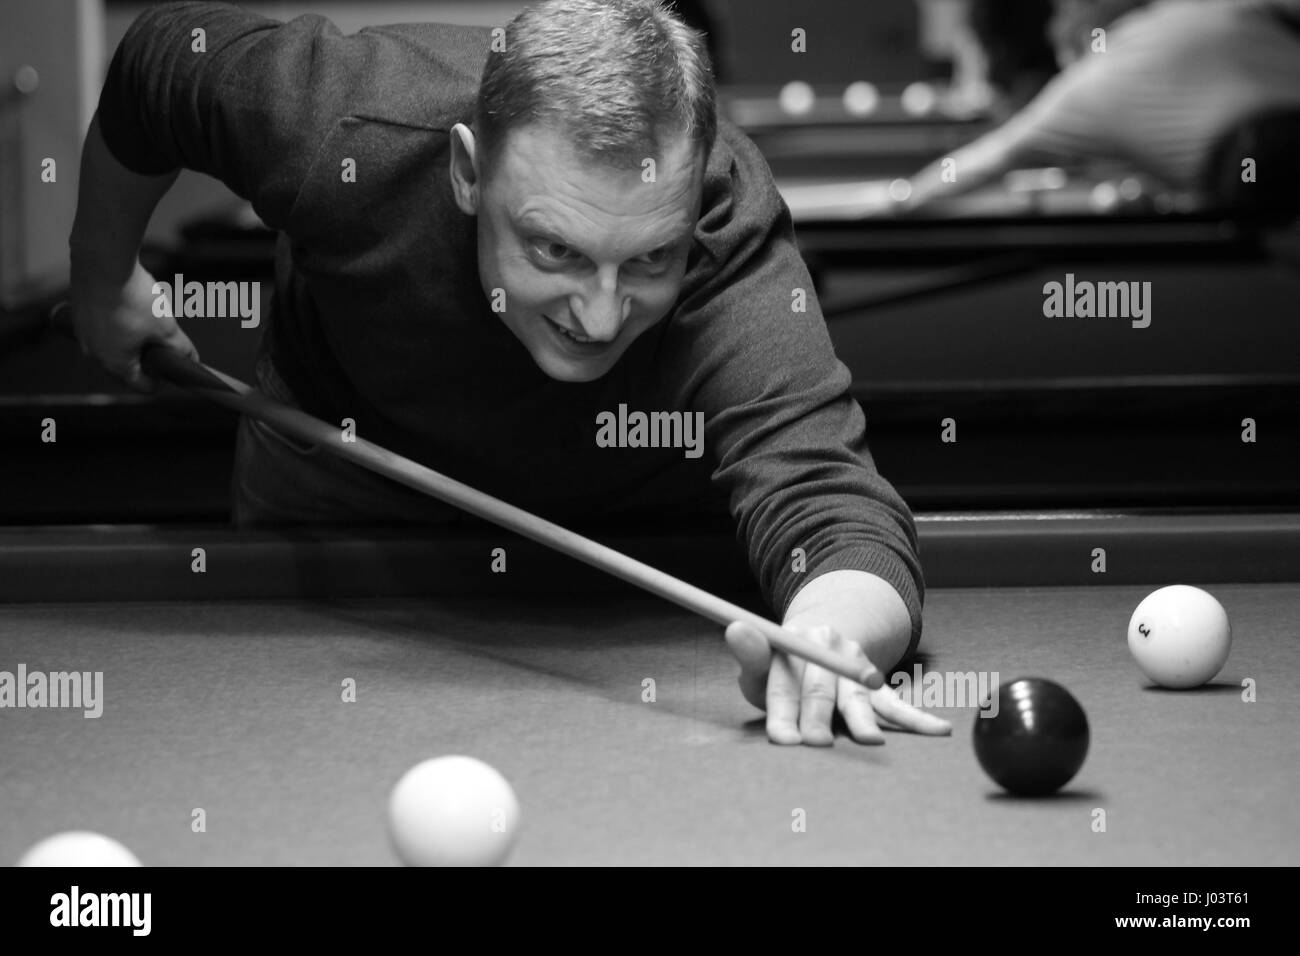 boy aiming for shot the billiard ball - Stock Image